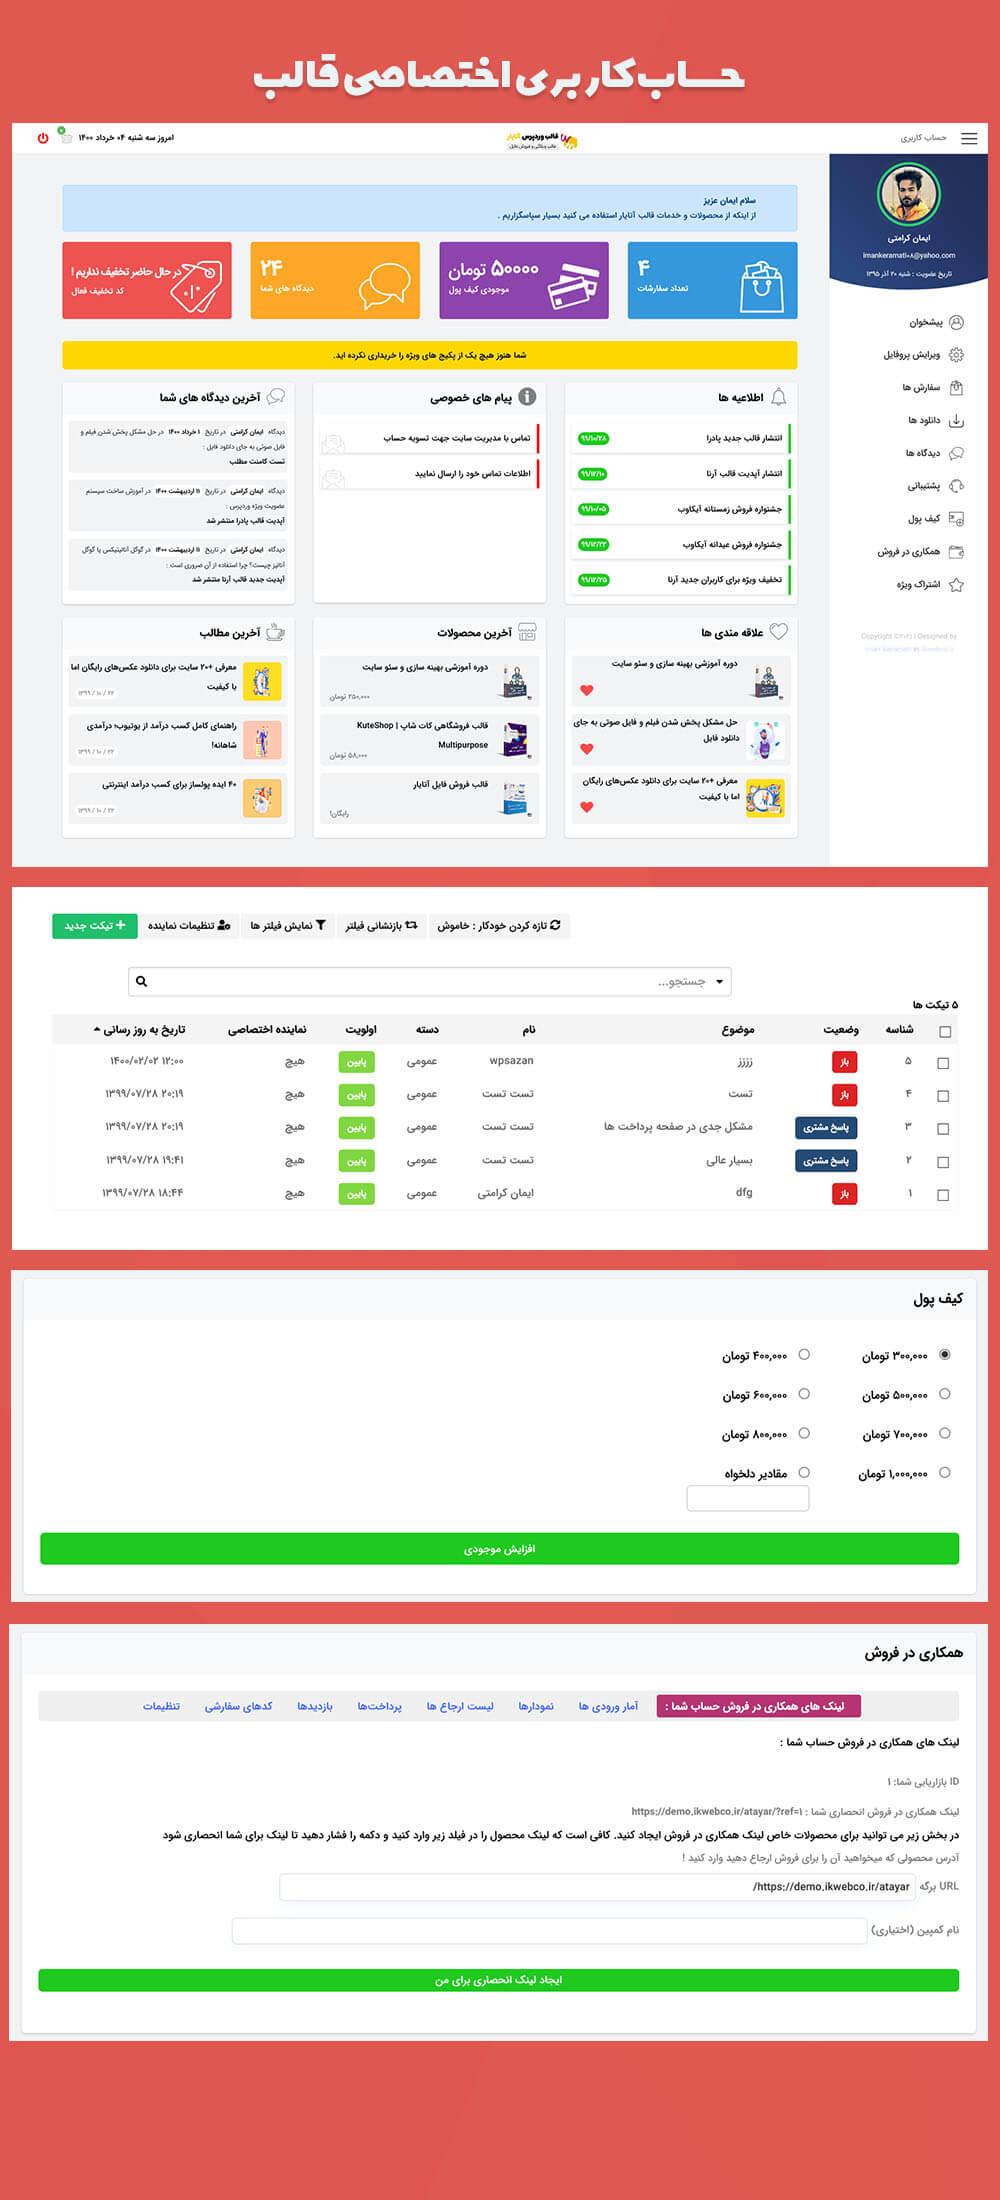 حساب کاربری قالب فروش فایل دانلودی دیاکو